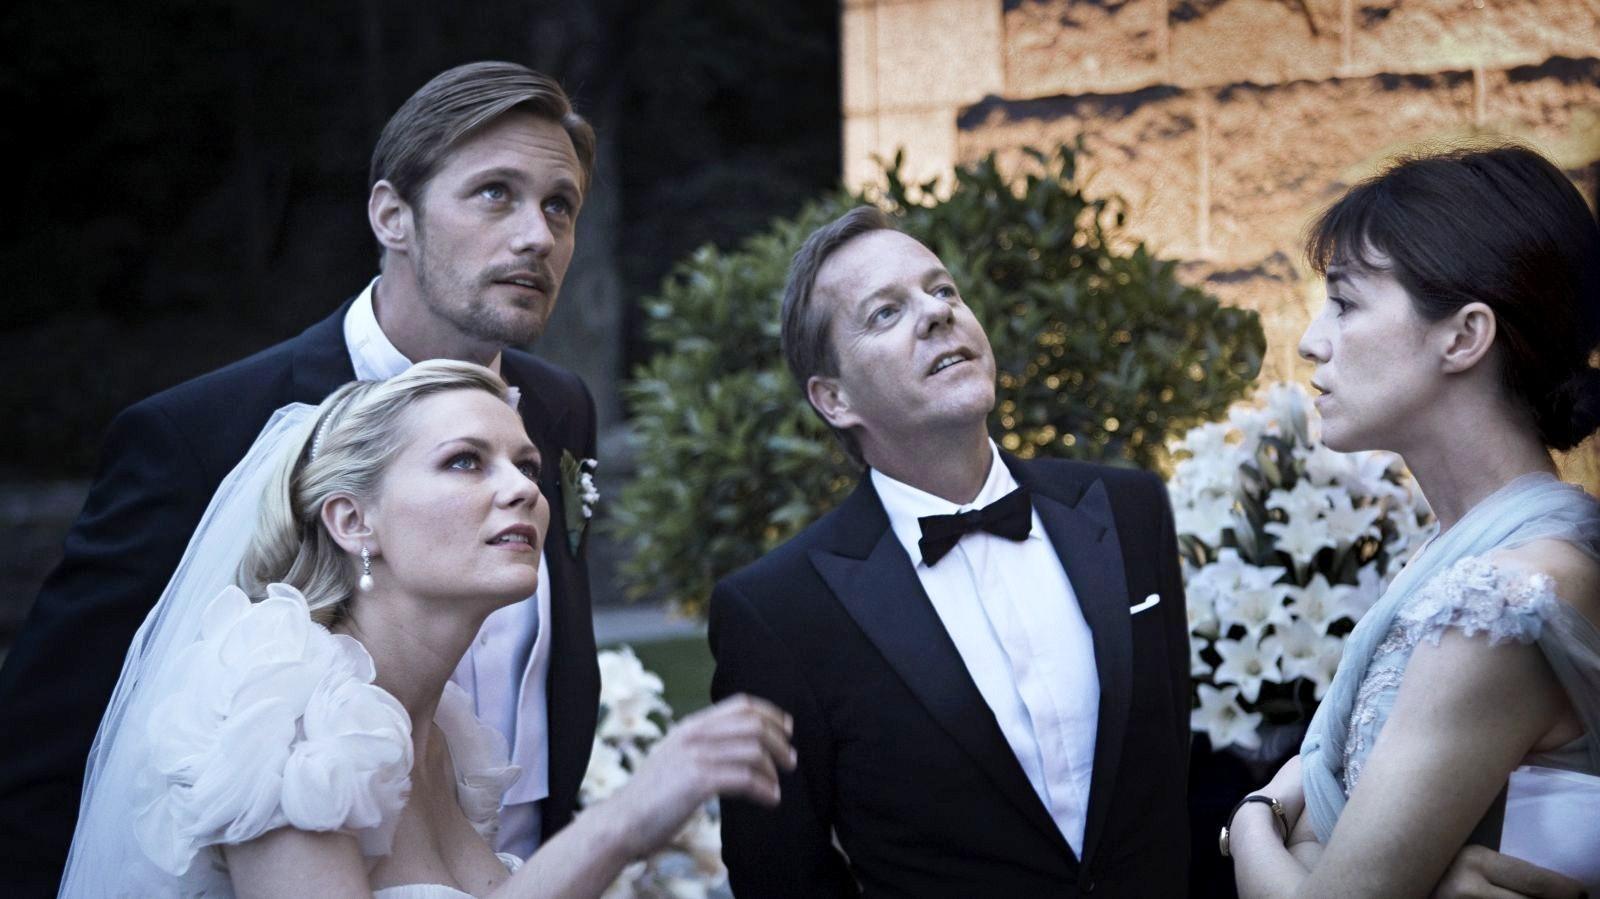 http://1.bp.blogspot.com/-_Twla21x8K4/TprmJKXkycI/AAAAAAAAGNU/rx6fm1xdU0Q/s1600/melancholia-movie-Alexander-Skarsgard_Kirsten-Dunst_Kiefer-Sutherland_Charlotte-Gainsbourg-8.jpg